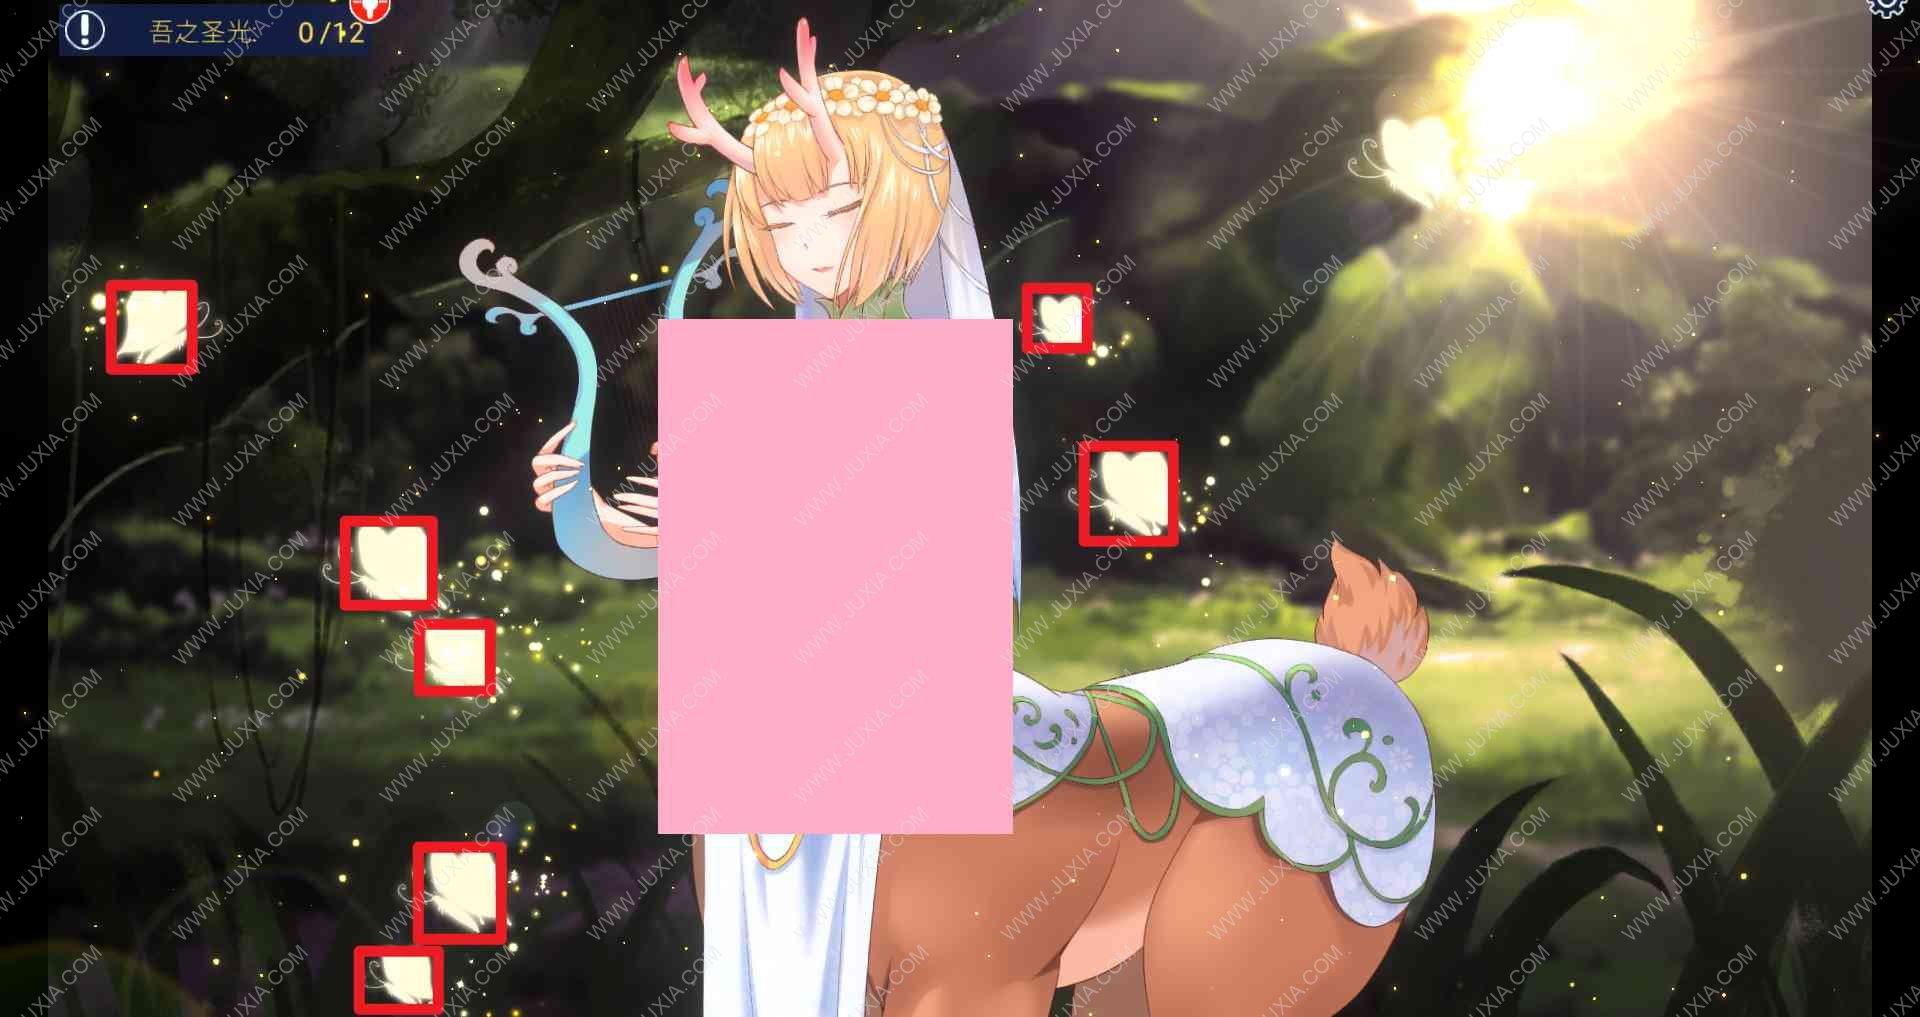 Aurora攻略第七关怎么过 吾之圣光在哪